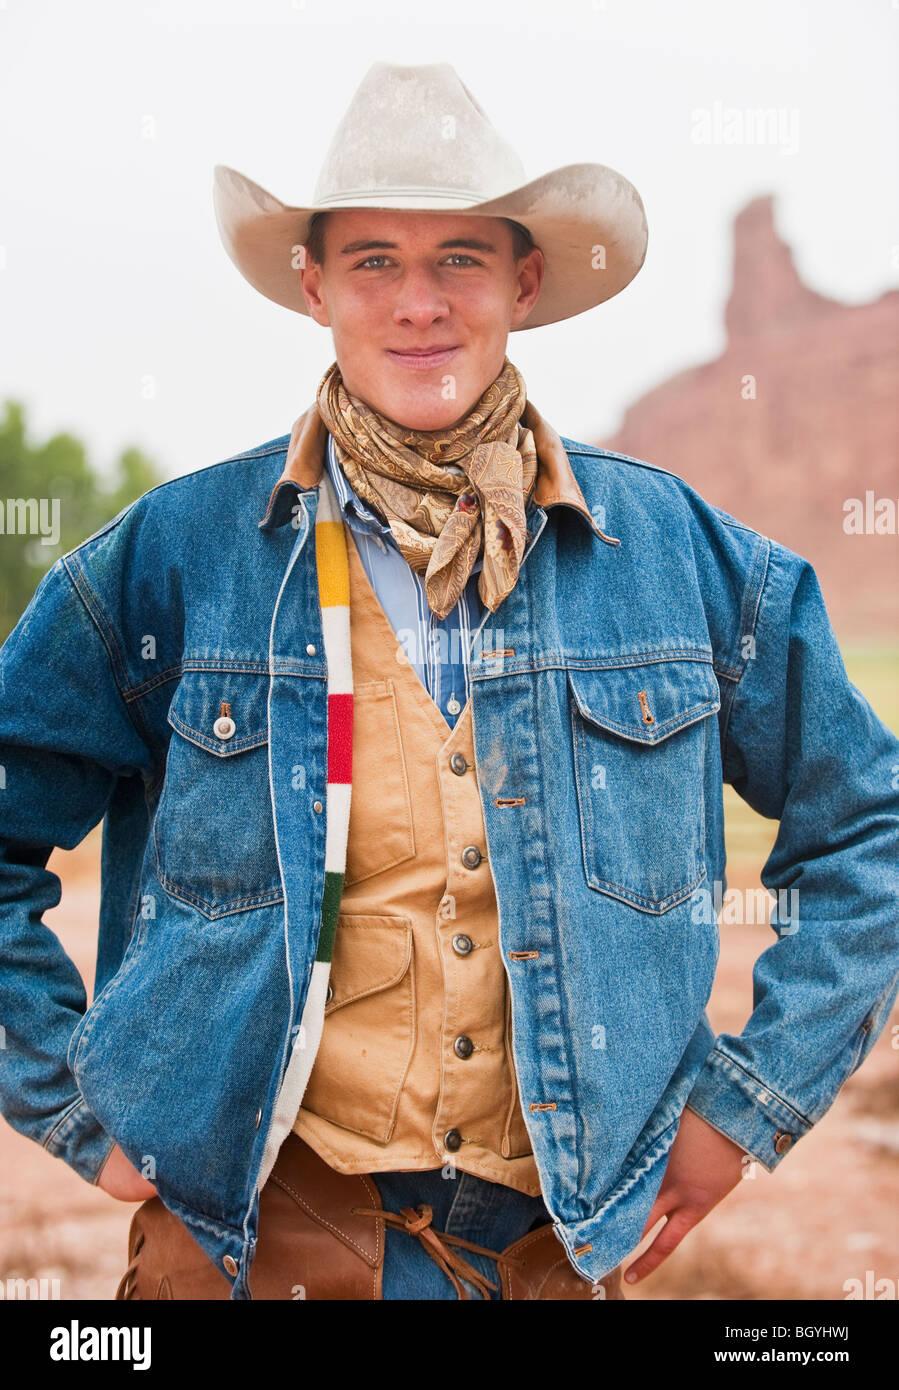 Cowboy - Stock Image